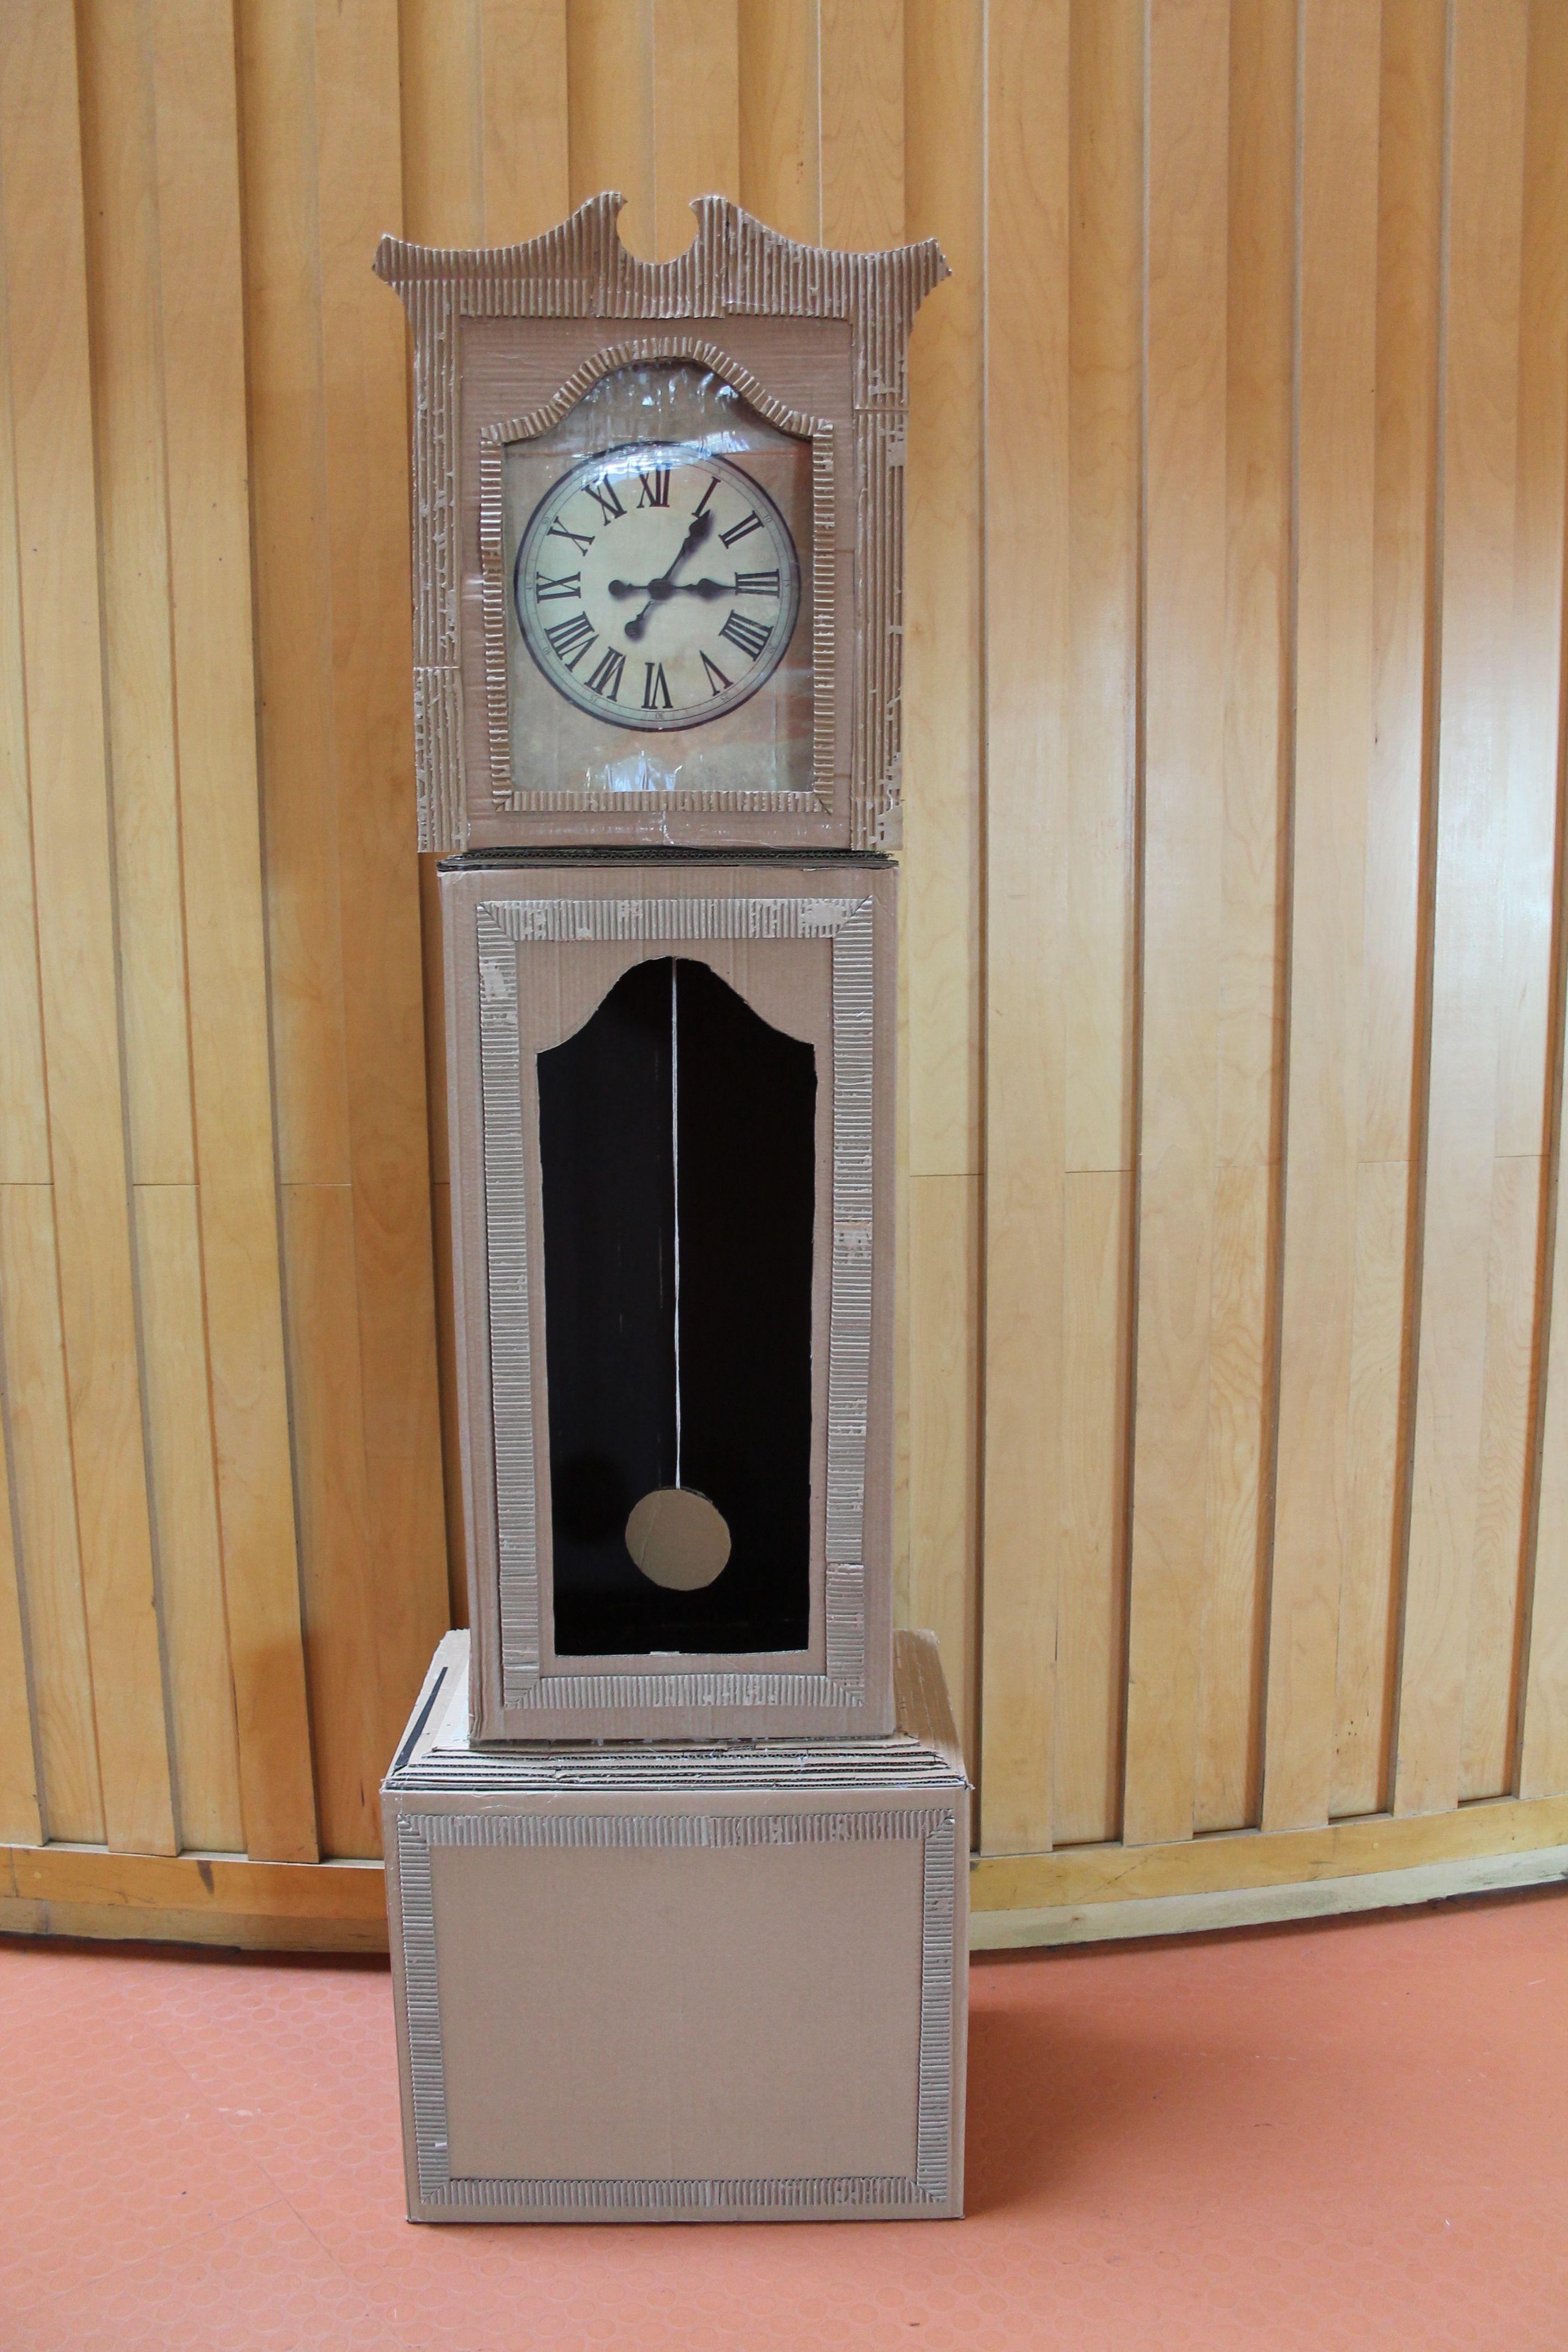 Cardboard Grandfather Clock (Life Size) by Anisha Mistry ...